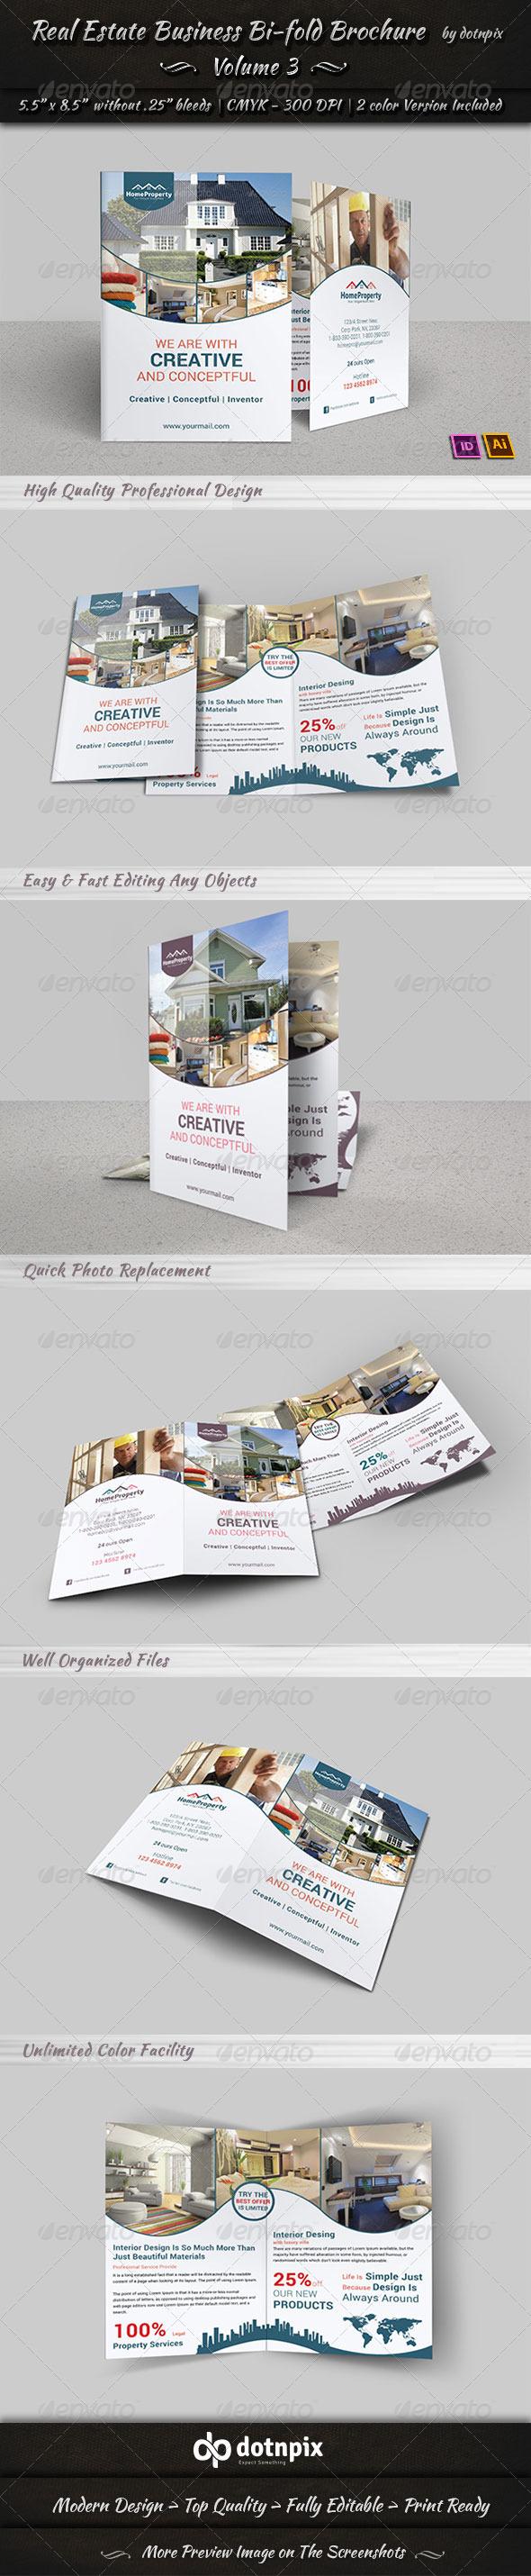 GraphicRiver Real Estate Business Bi-Fold Brochure Volume 3 6668291